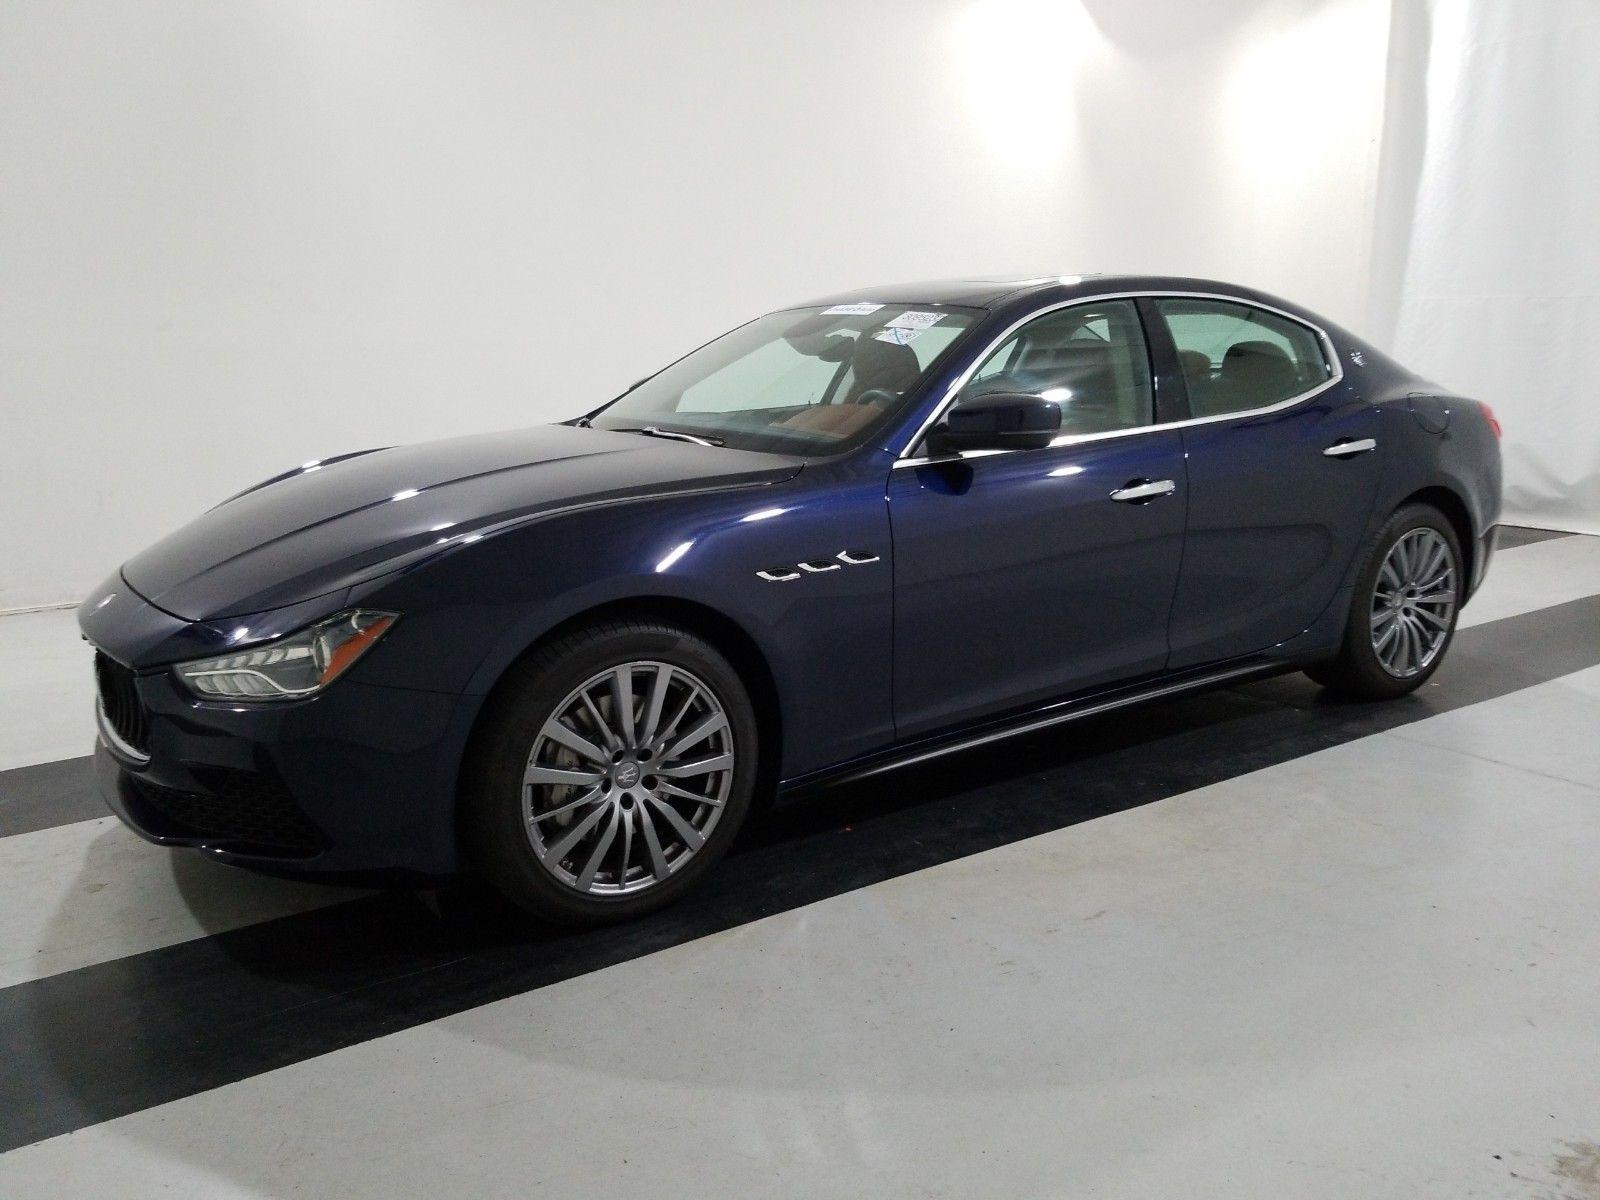 2017 Maserati Ghibli 3.0. Lot 99913814749 Vin ZAM57XSA8H1223856